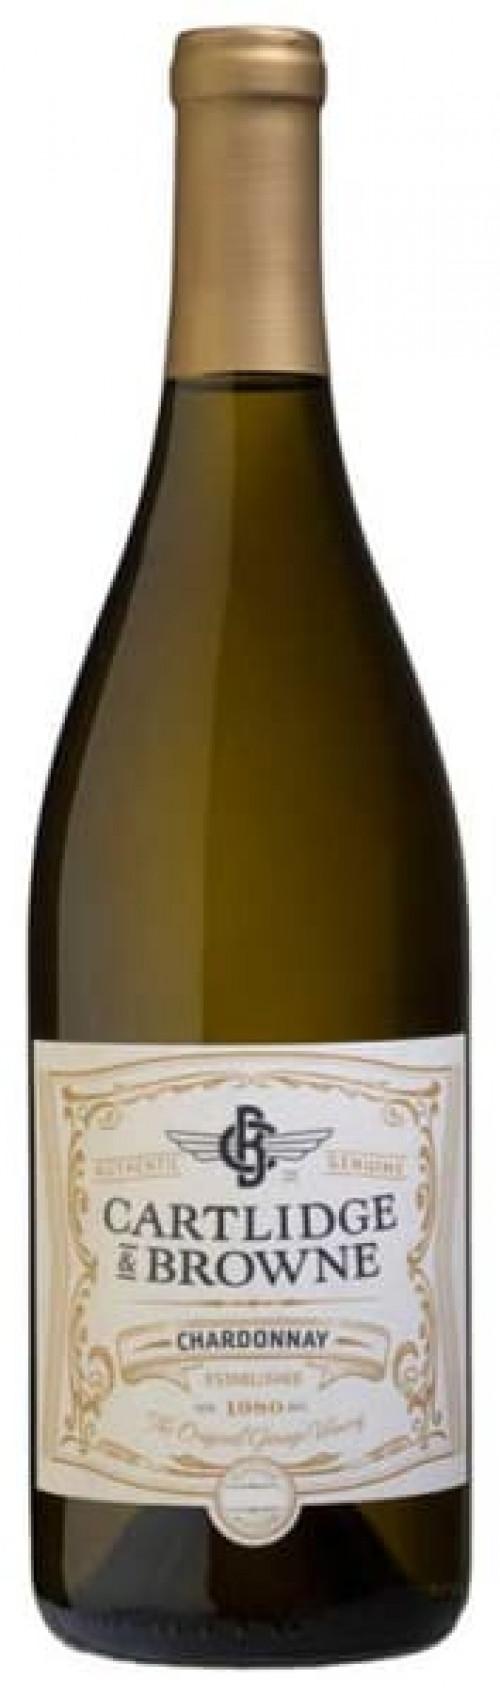 2019 Cartlidge & Browne Chardonnay 750ml